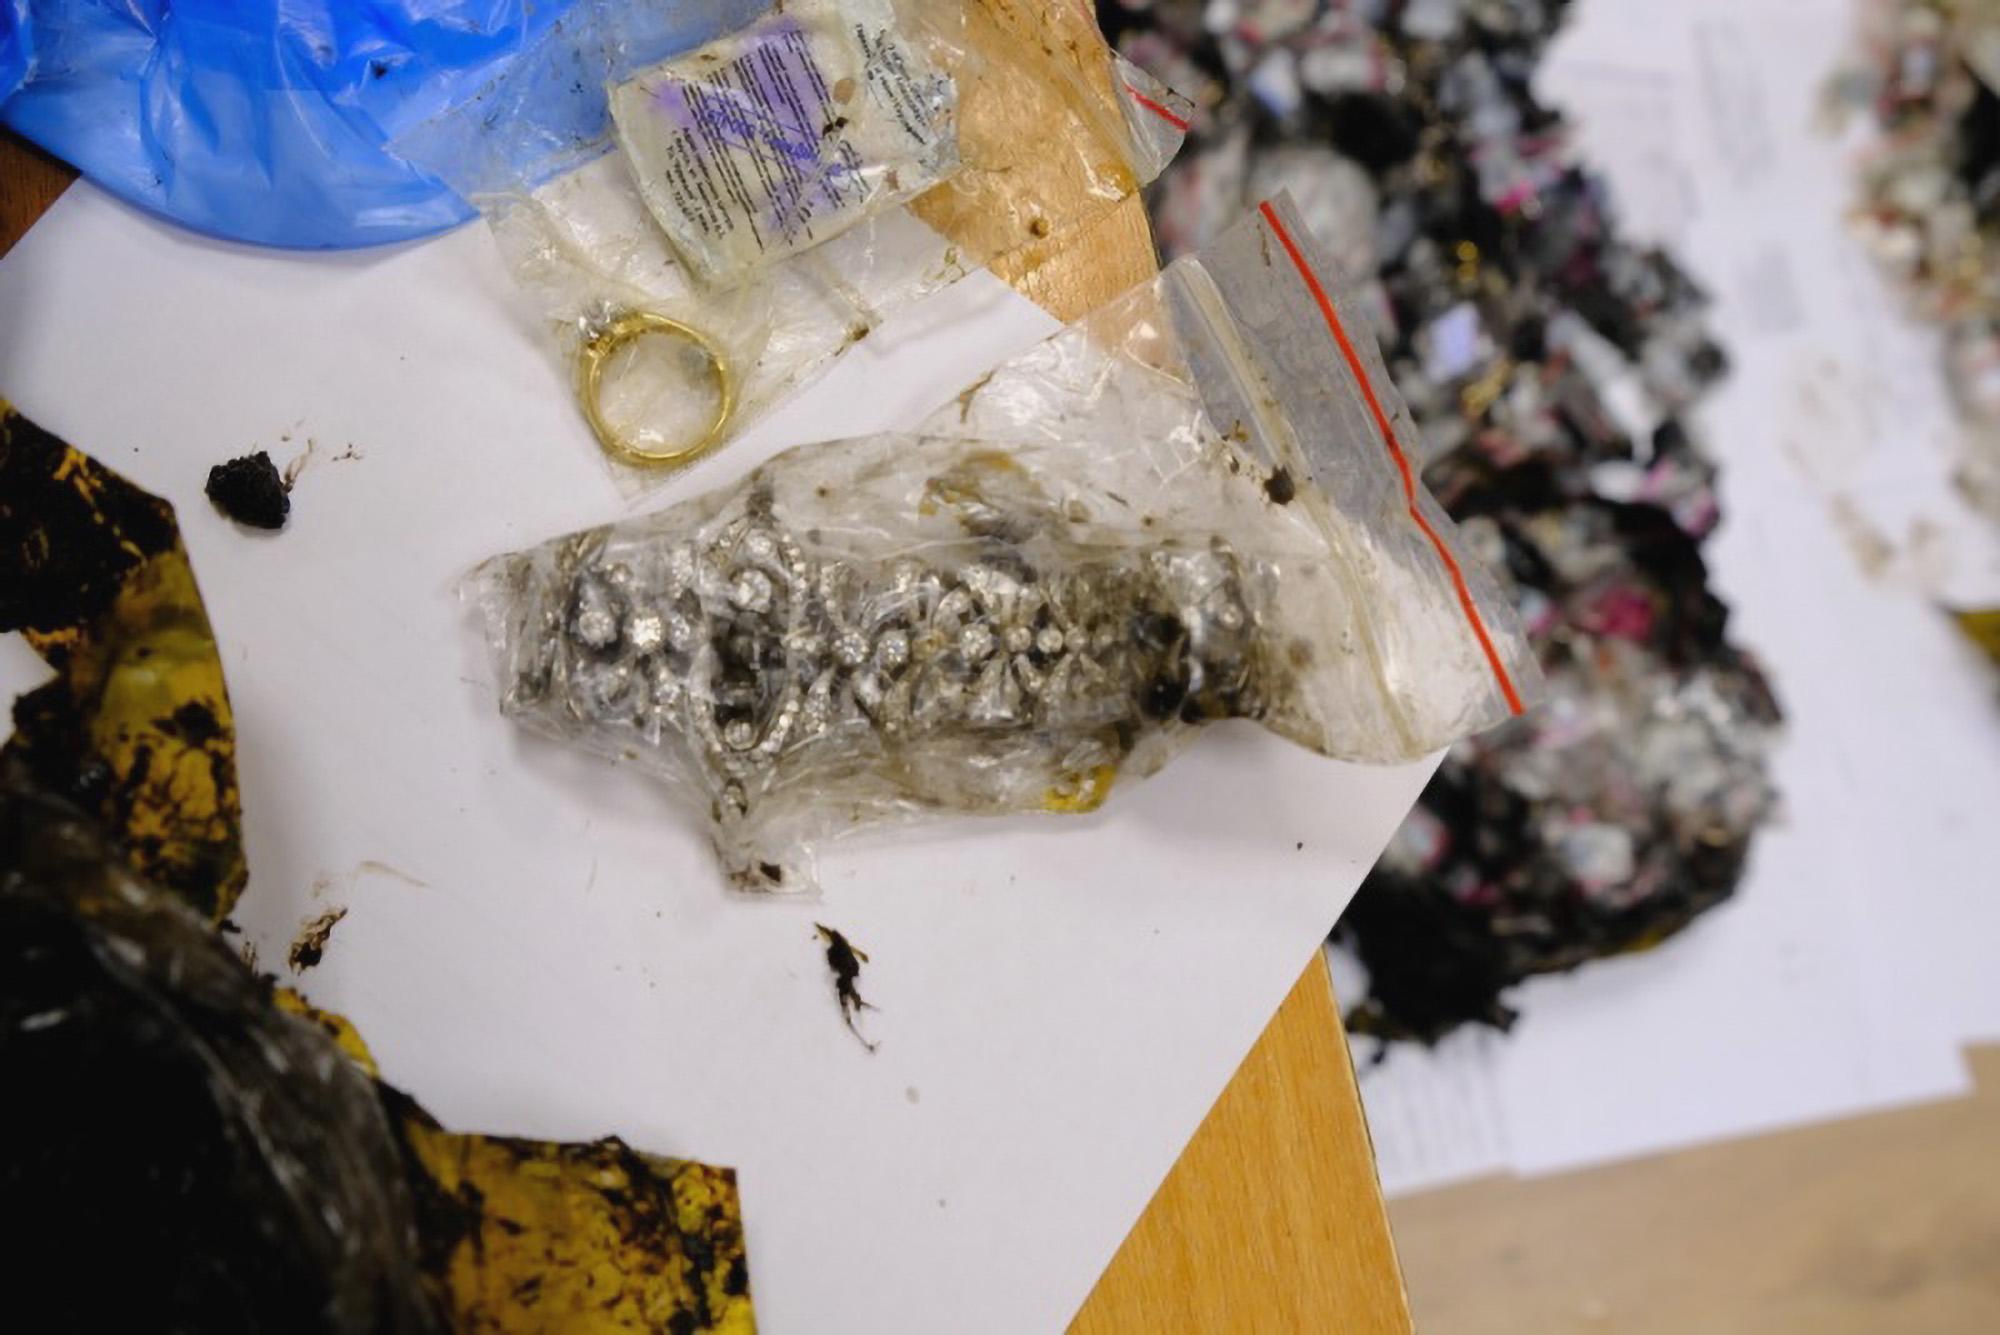 VIDEO: Rough Diamonds: $2 Million In Gems Found Buried In Scrubland Three Years After Heist